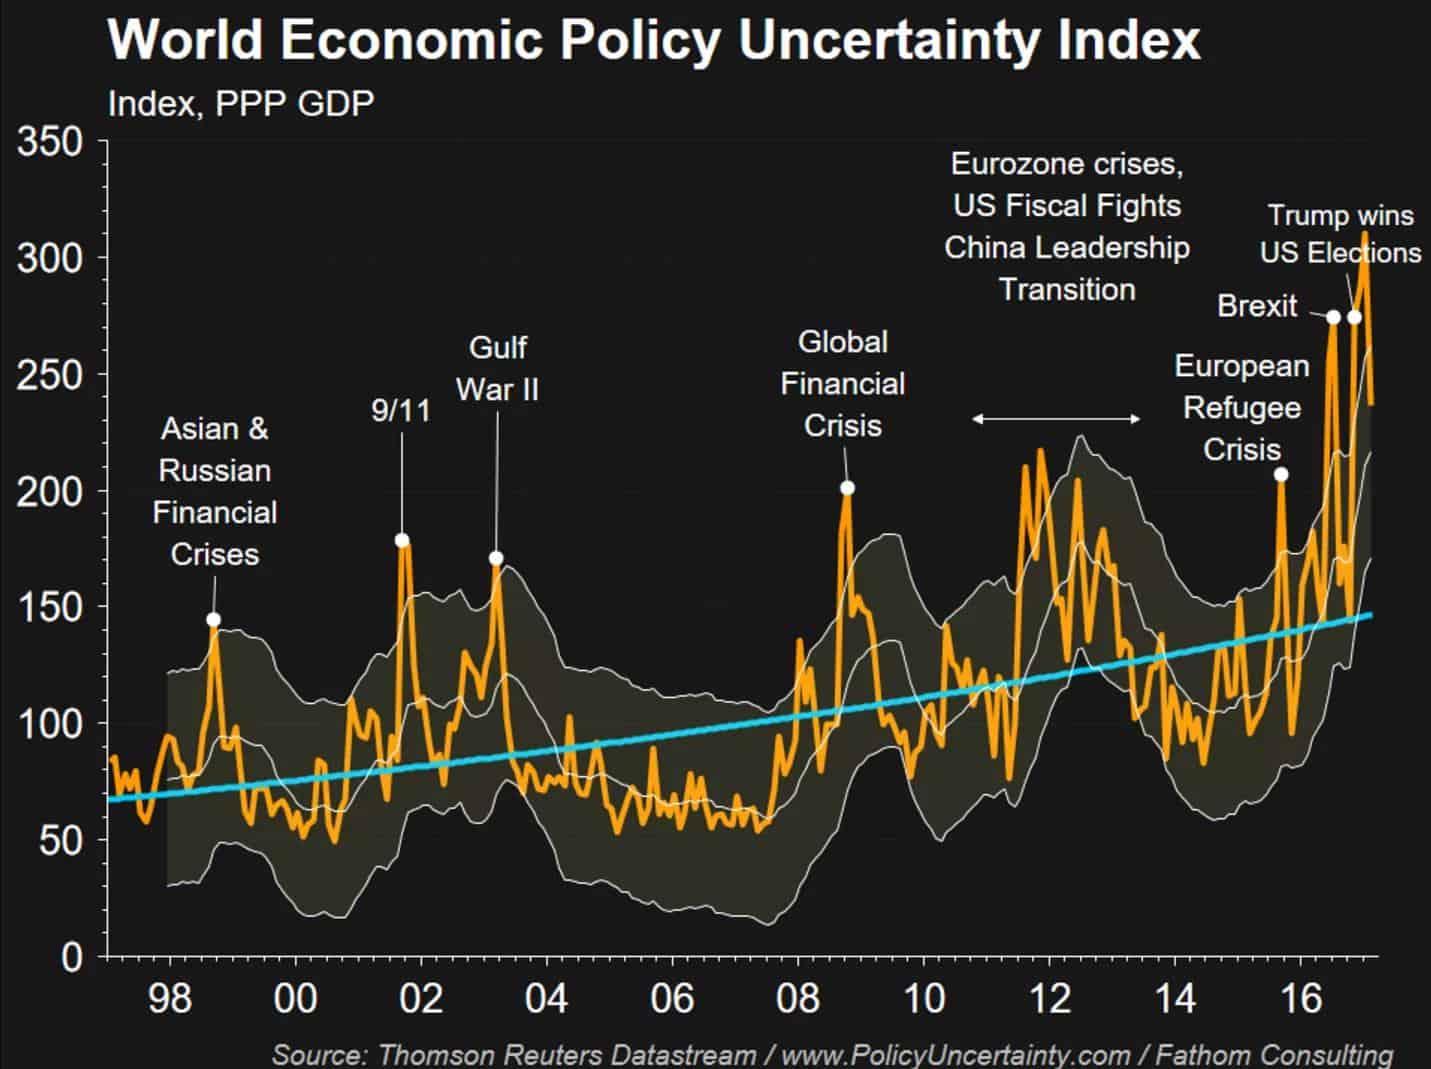 World Economic Policy Uncertainty Index 1